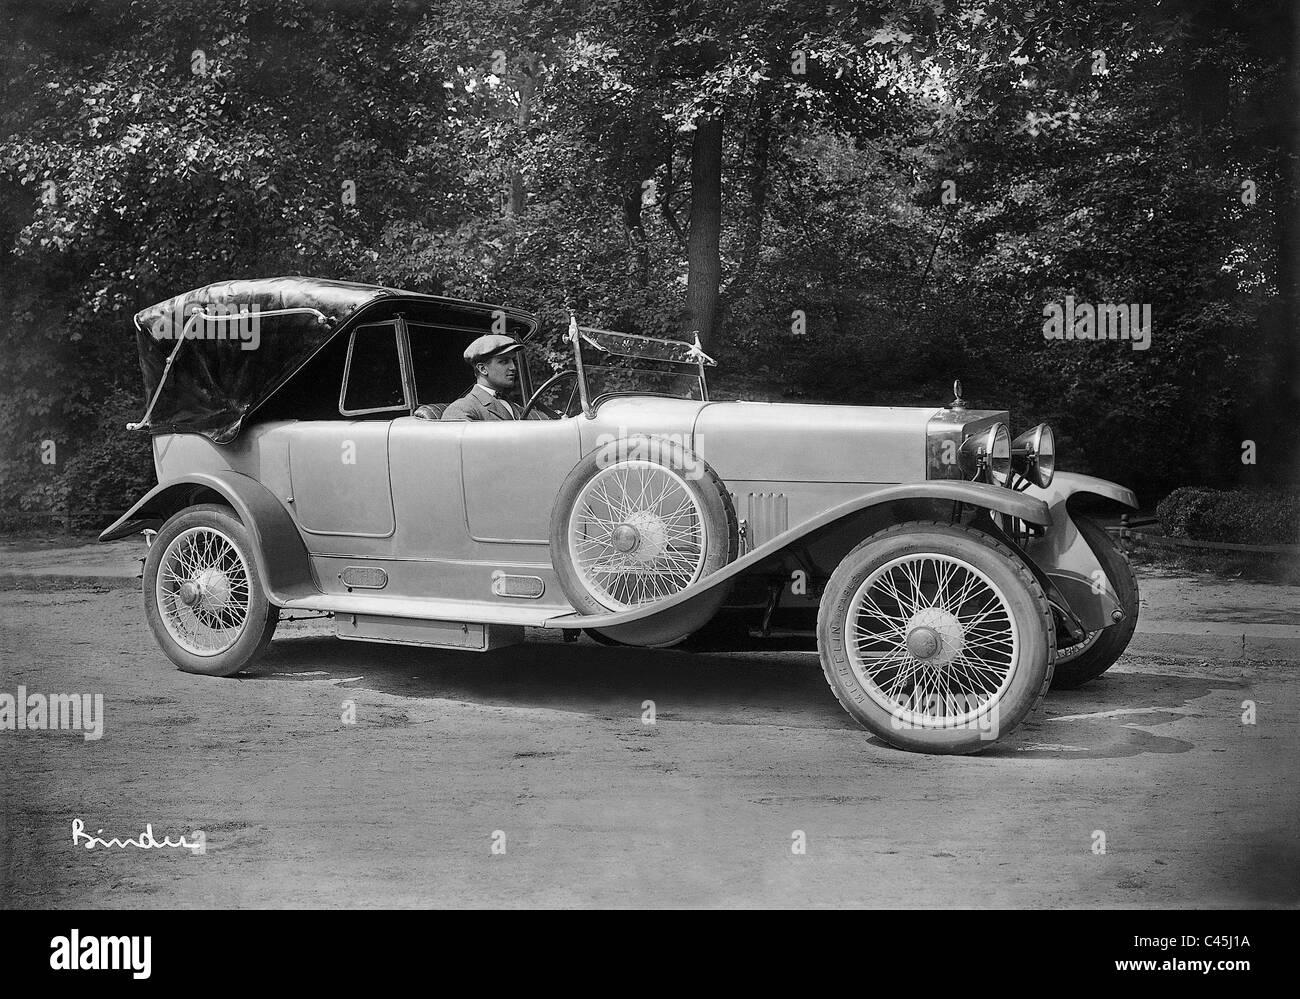 Automobile von Alfa Romeo, 1926 Stockbild